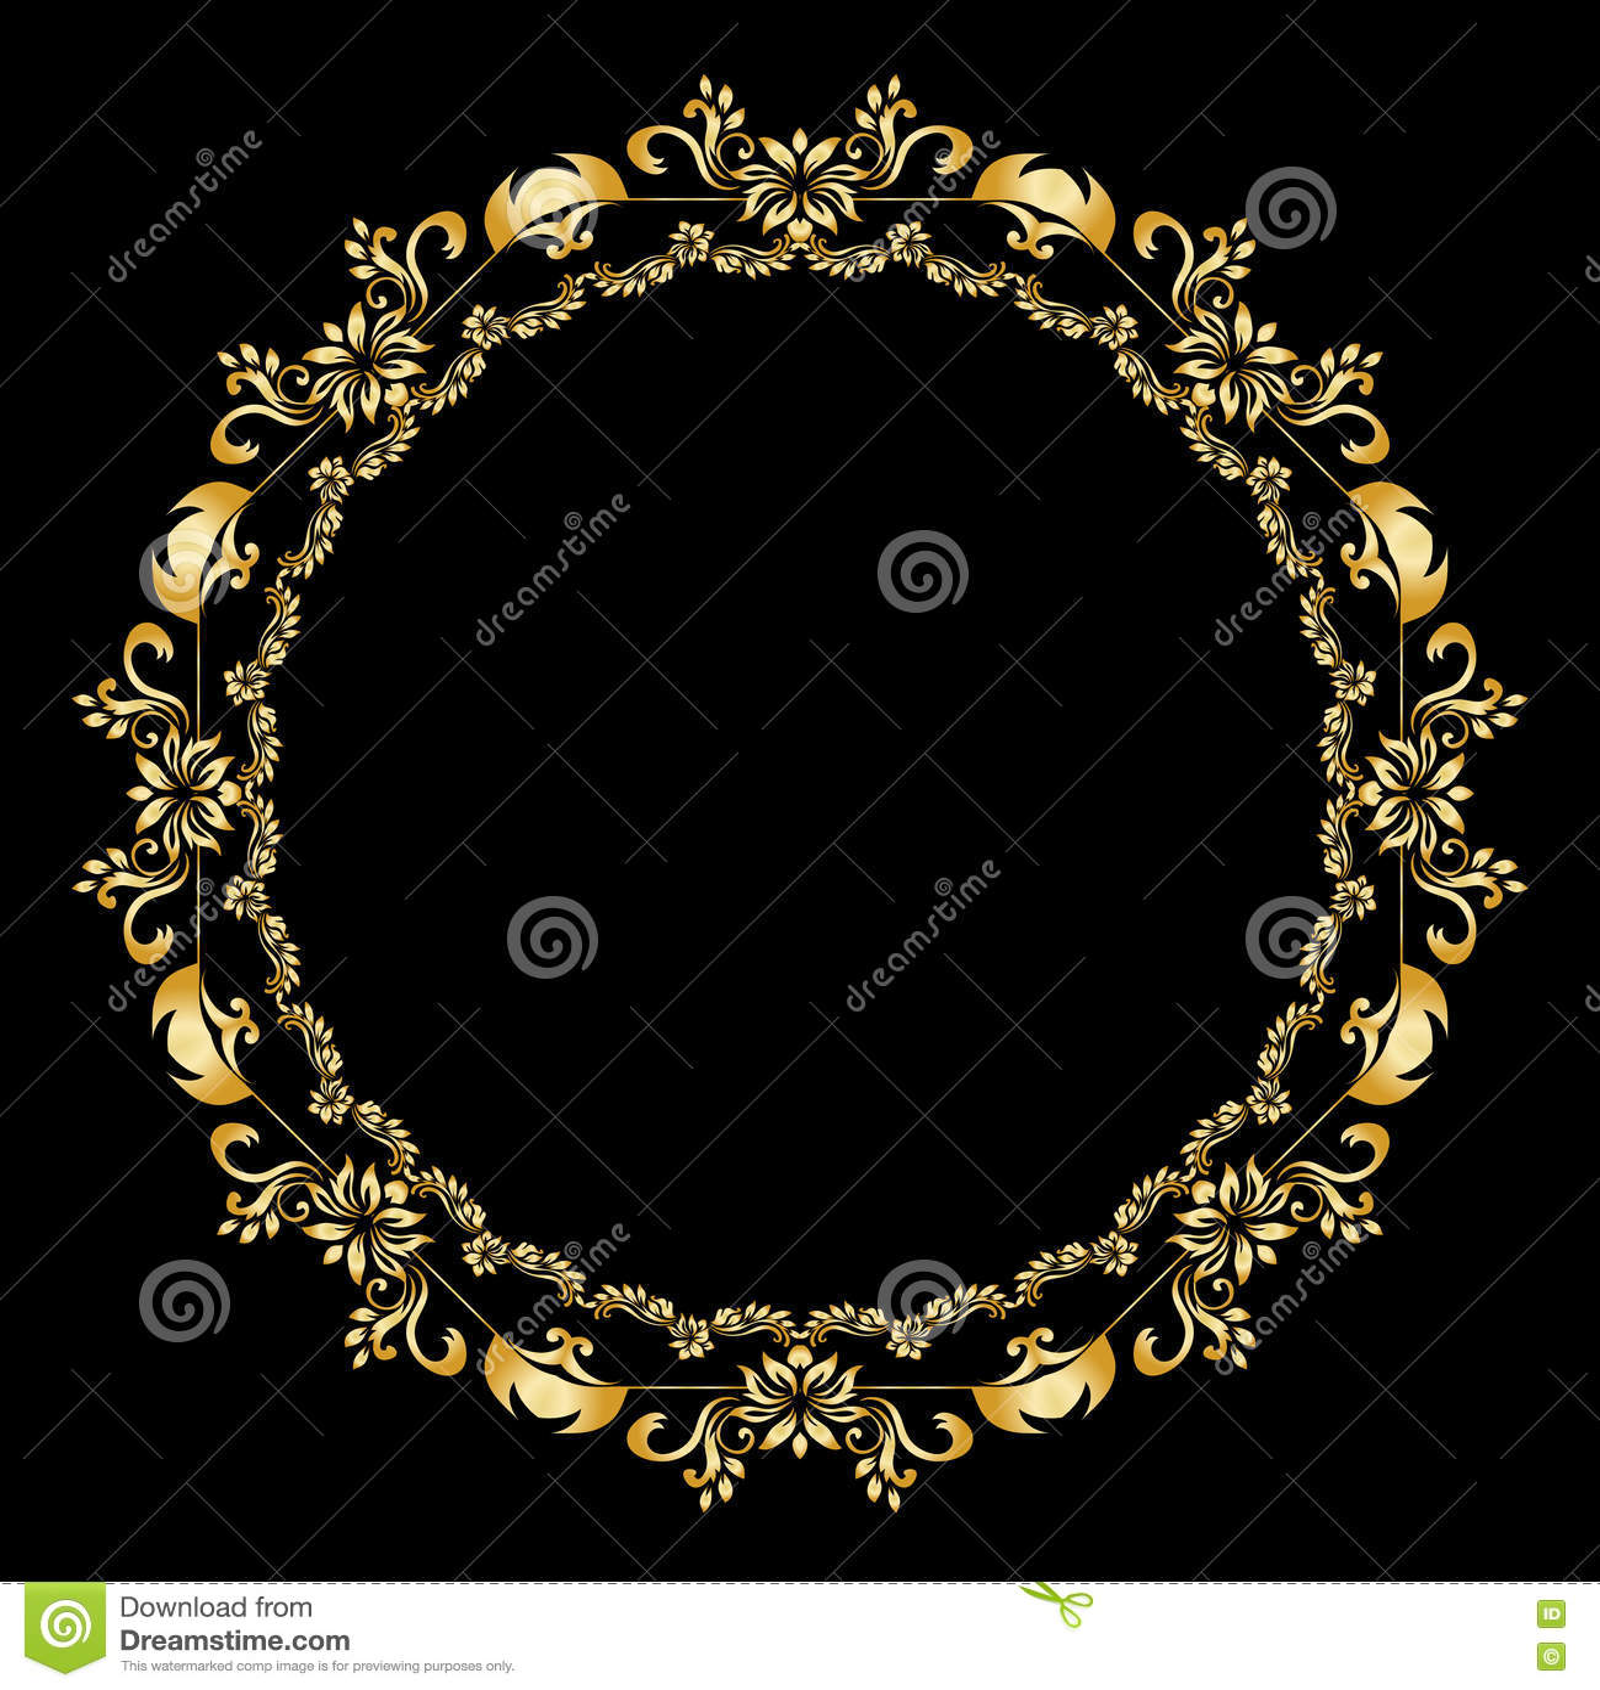 Golden calligraphic vector design elements on the black background golden calligraphic vector design elements on the black background gold menu and invitation border round framedivider filigree badge stopboris Gallery